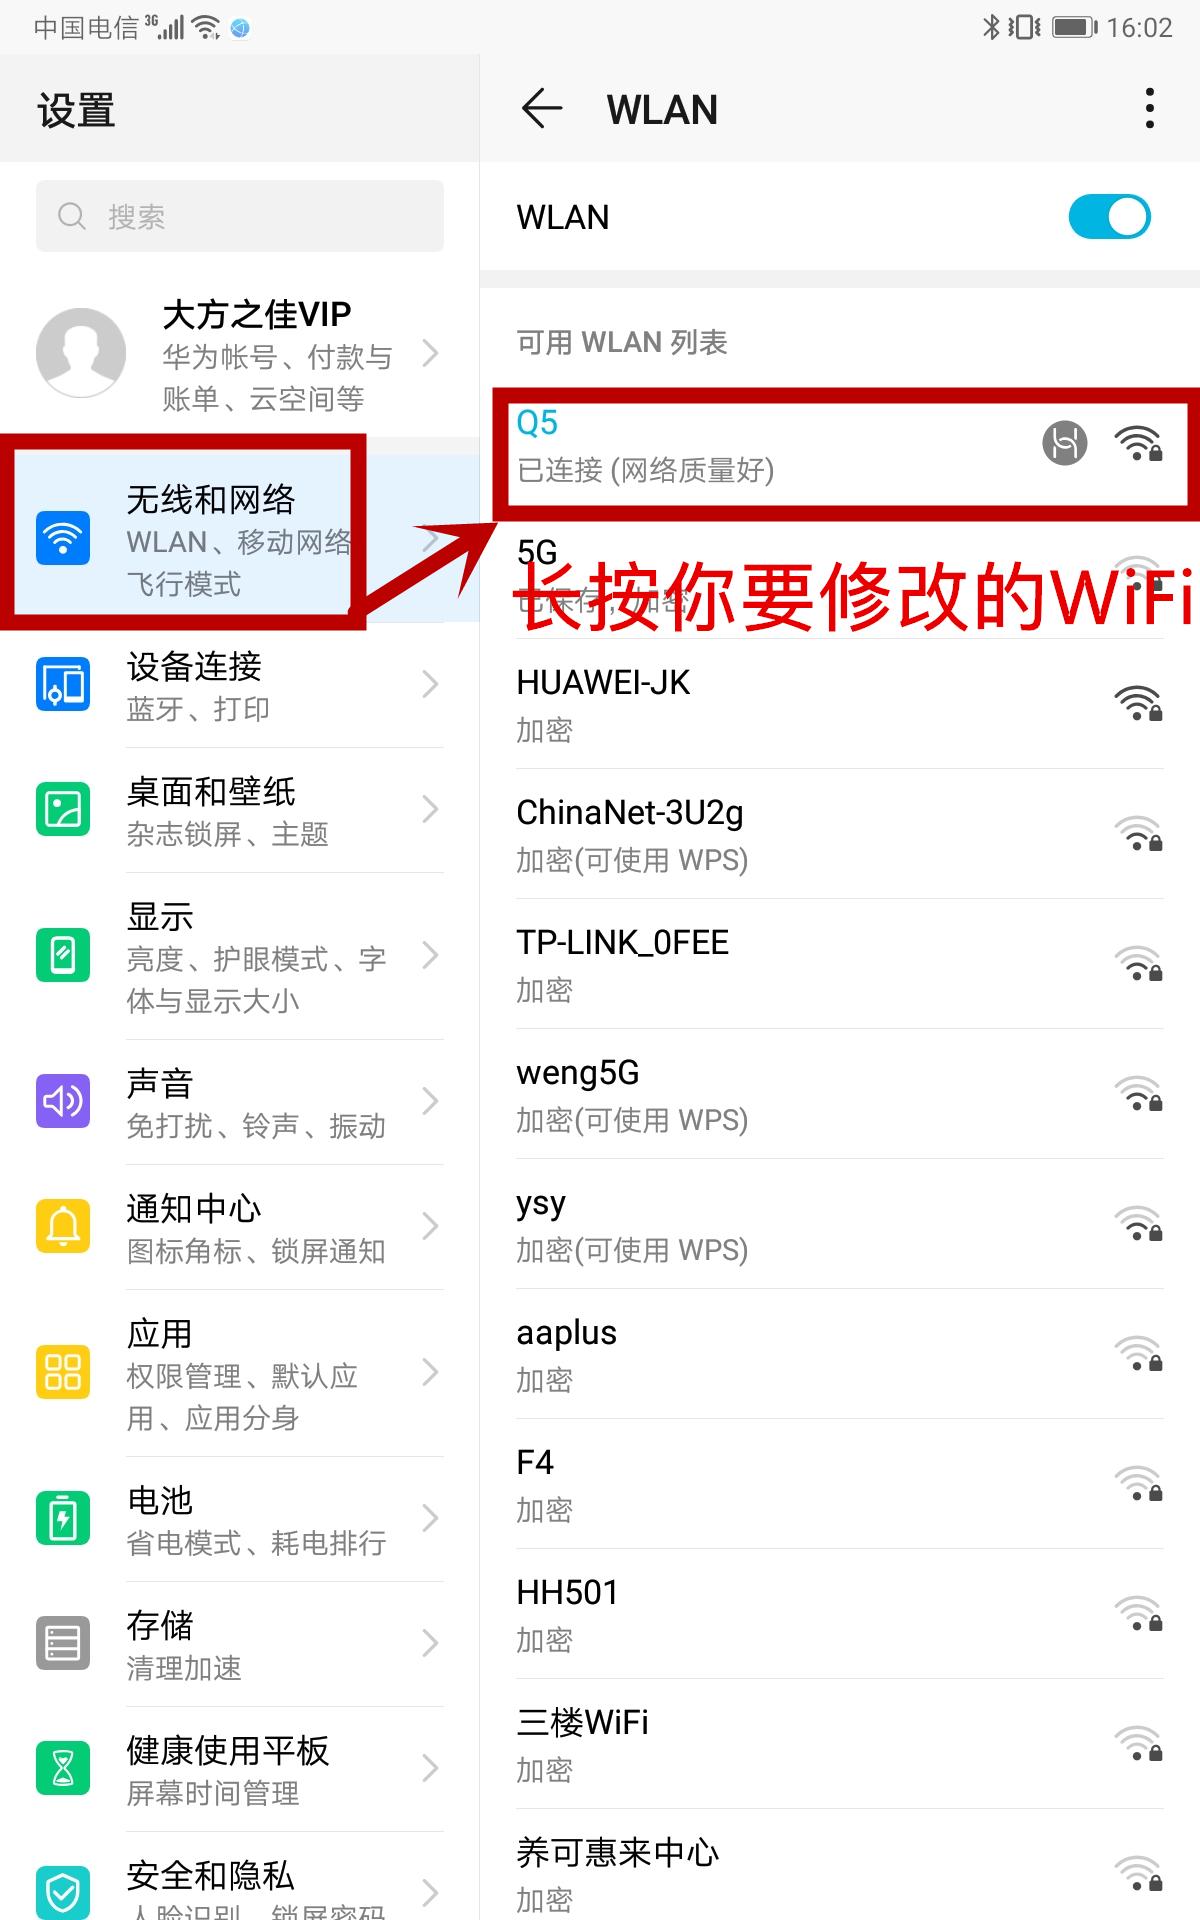 Screenshot_20190416_160254_com.android.settings.jpg